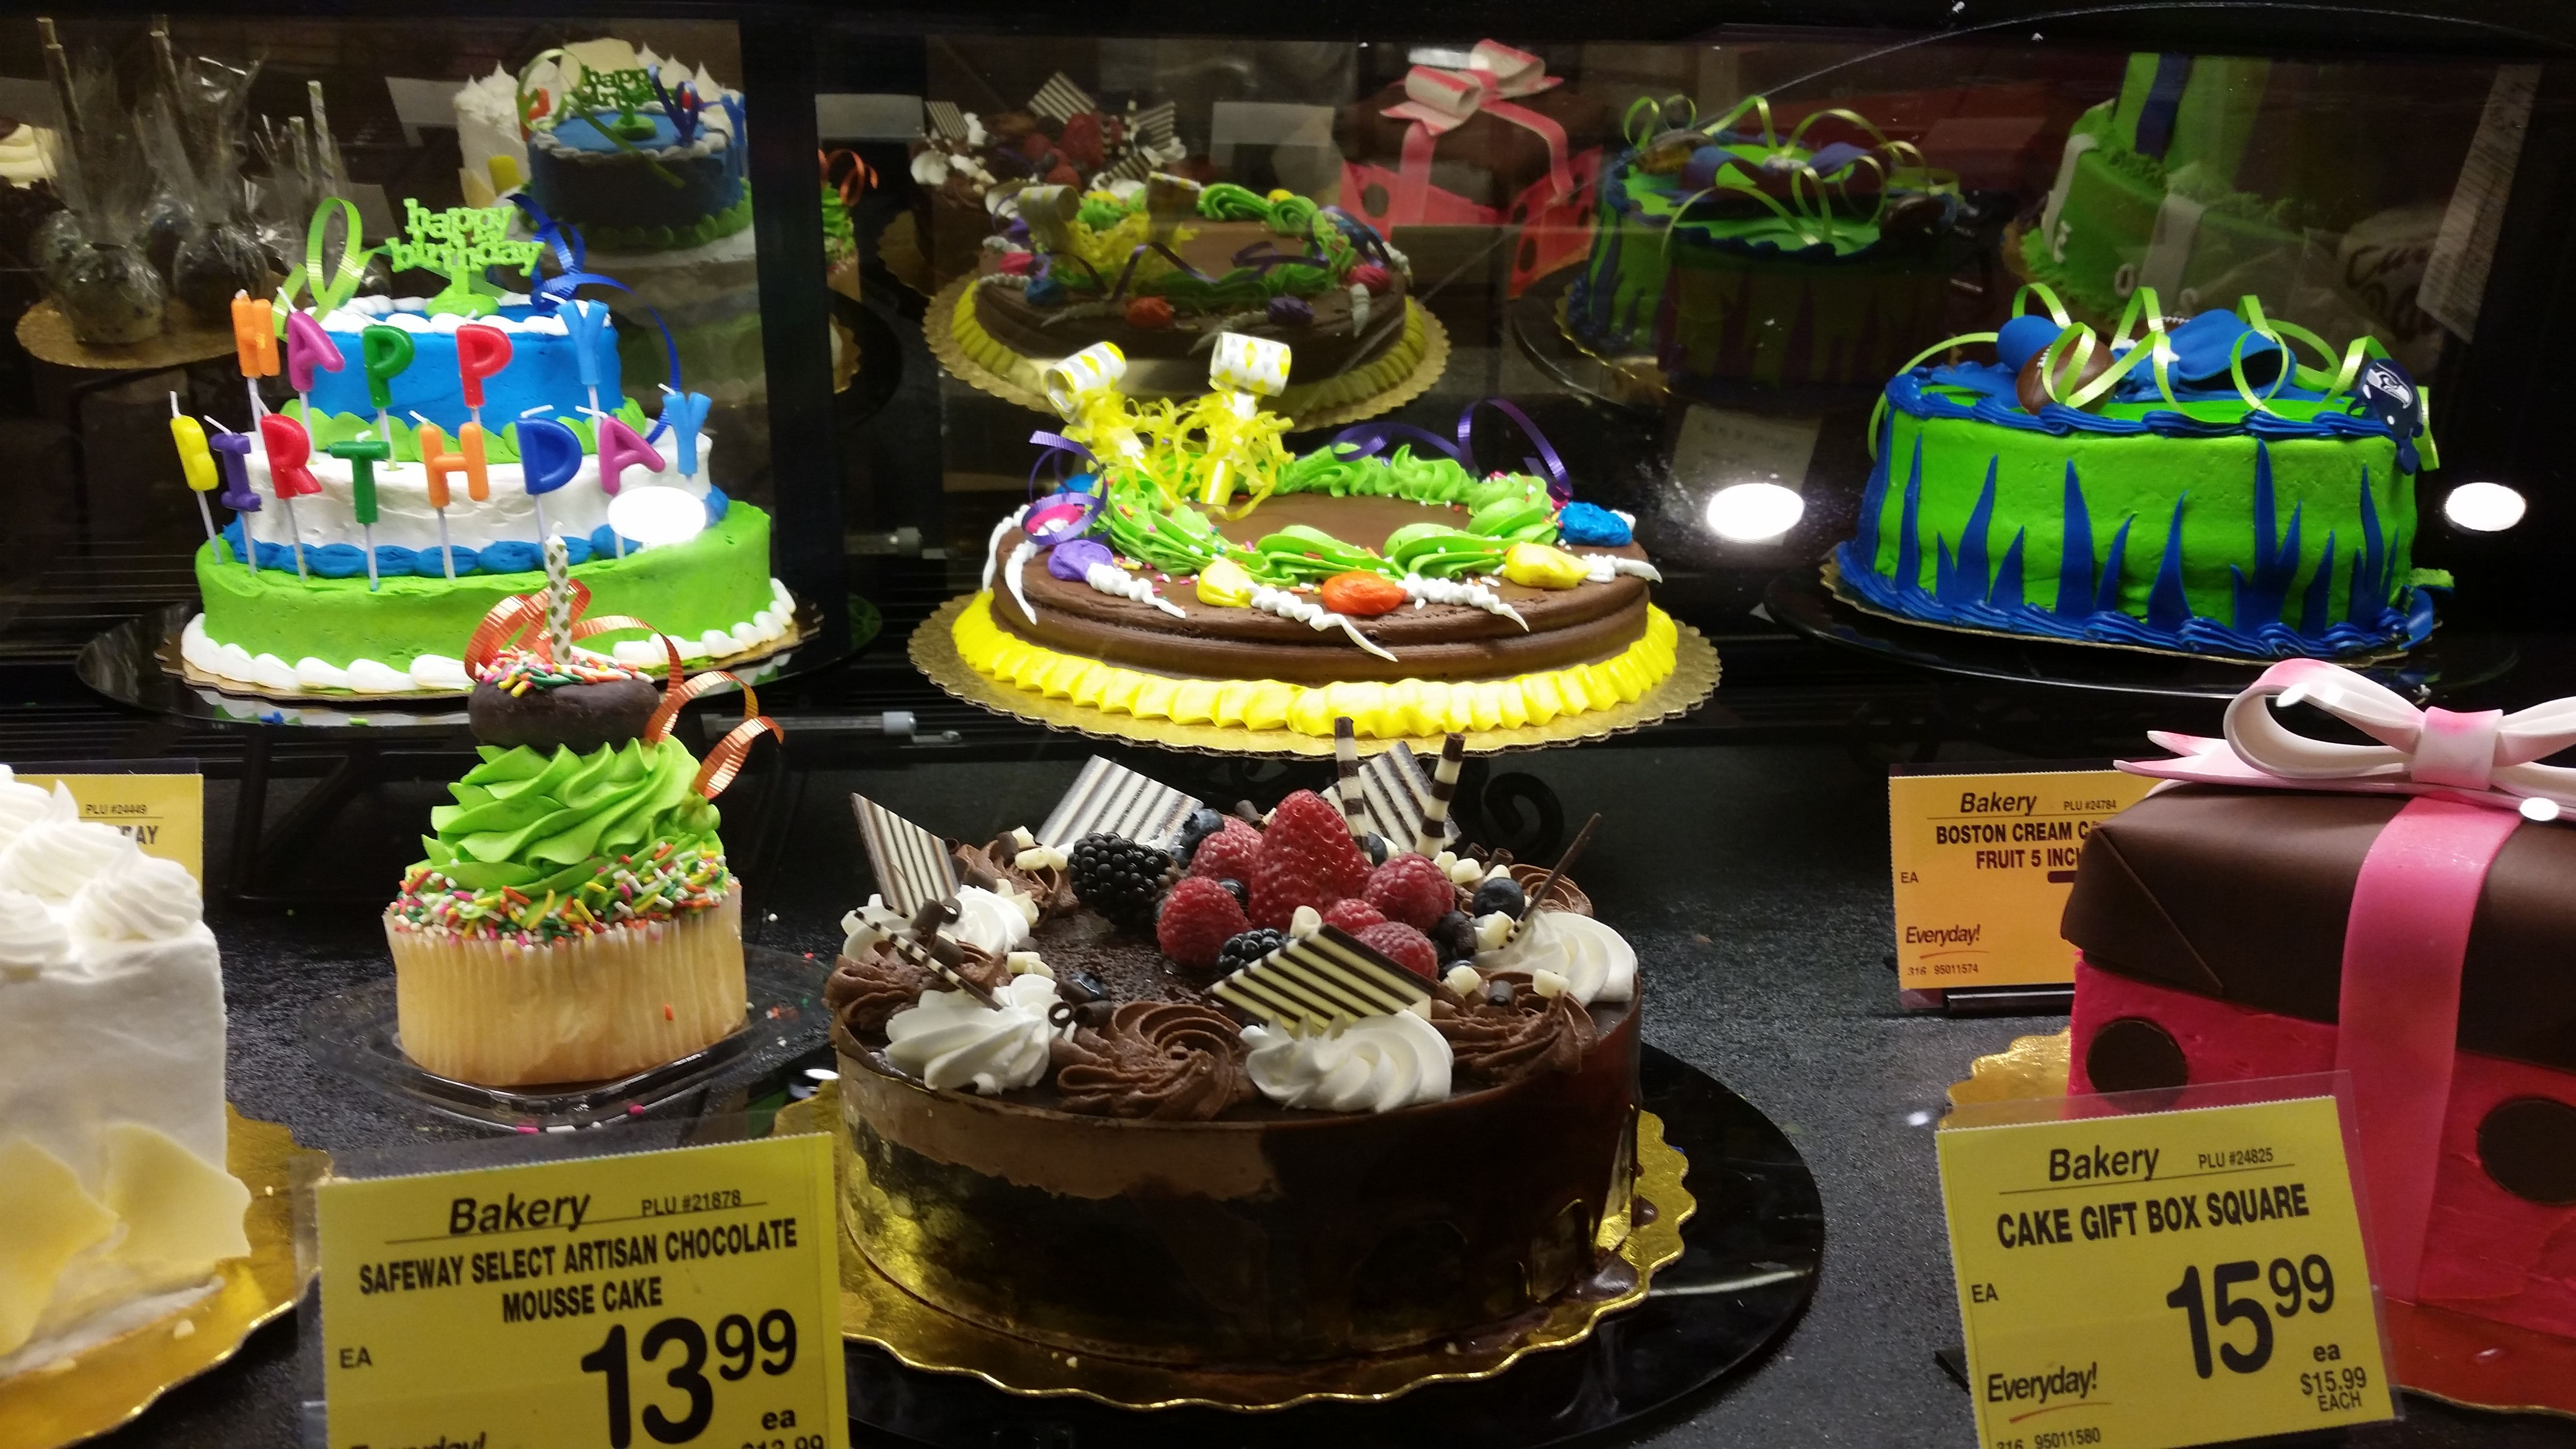 Safeway Halloween Cake Cartooncreative